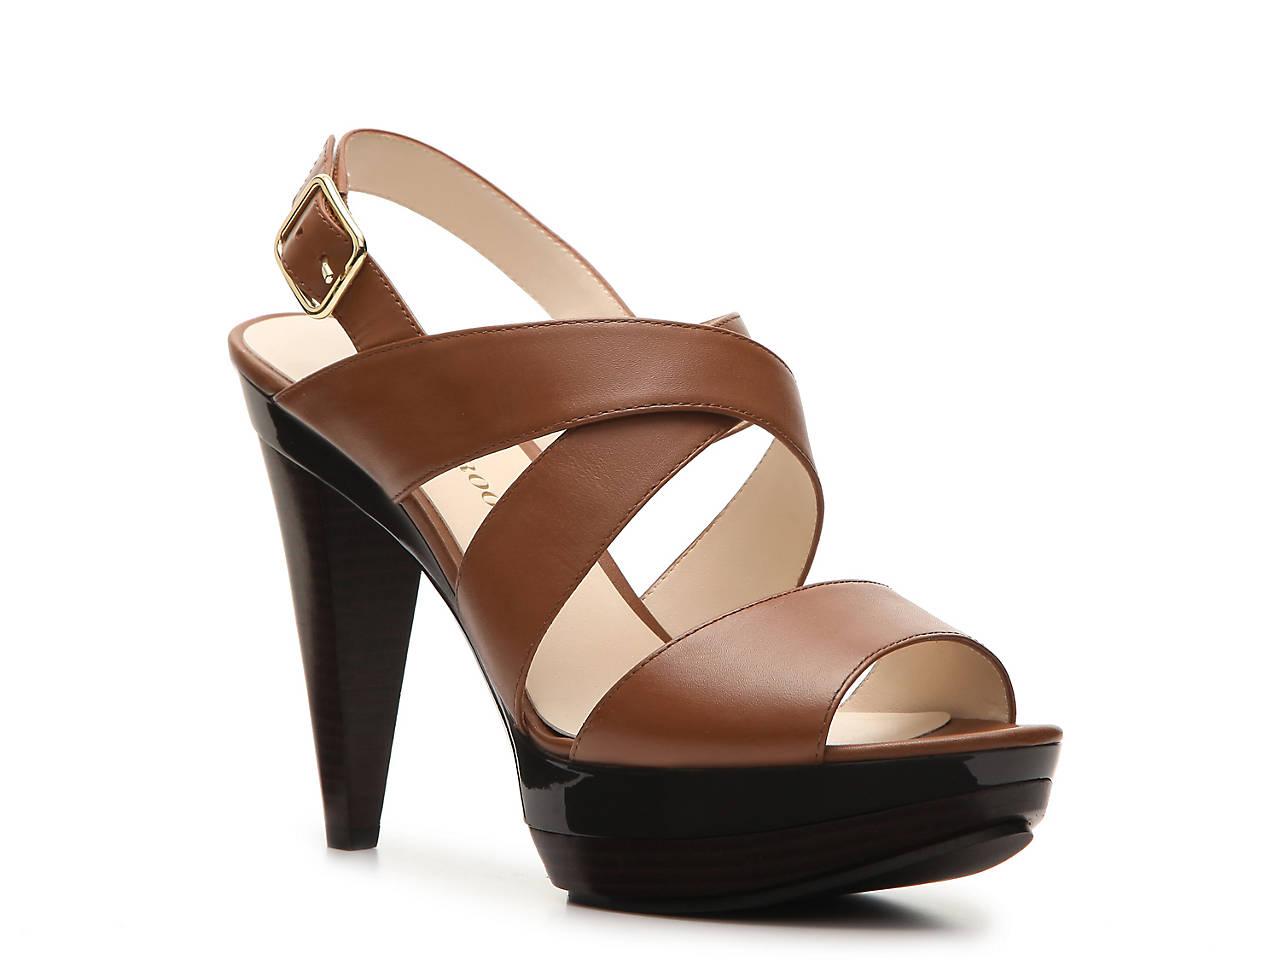 a46414775a Audrey Brooke Shoes - Audrey Brooke Nadine Sandal. Abram Sandal